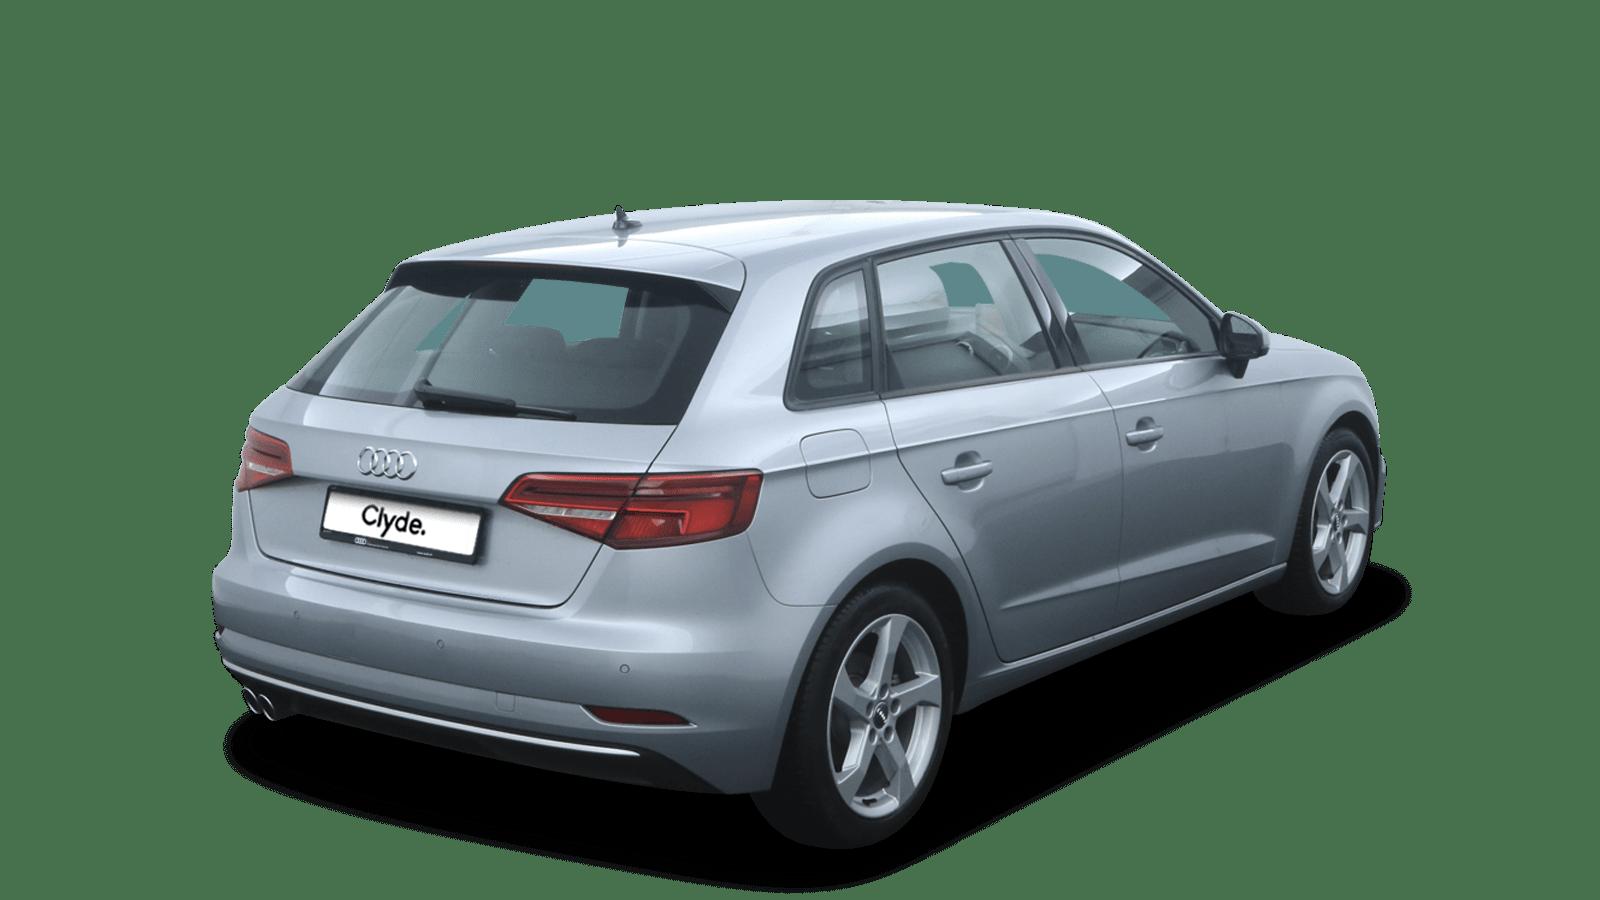 Audi A3 Sportback Silver back - Clyde car subscription